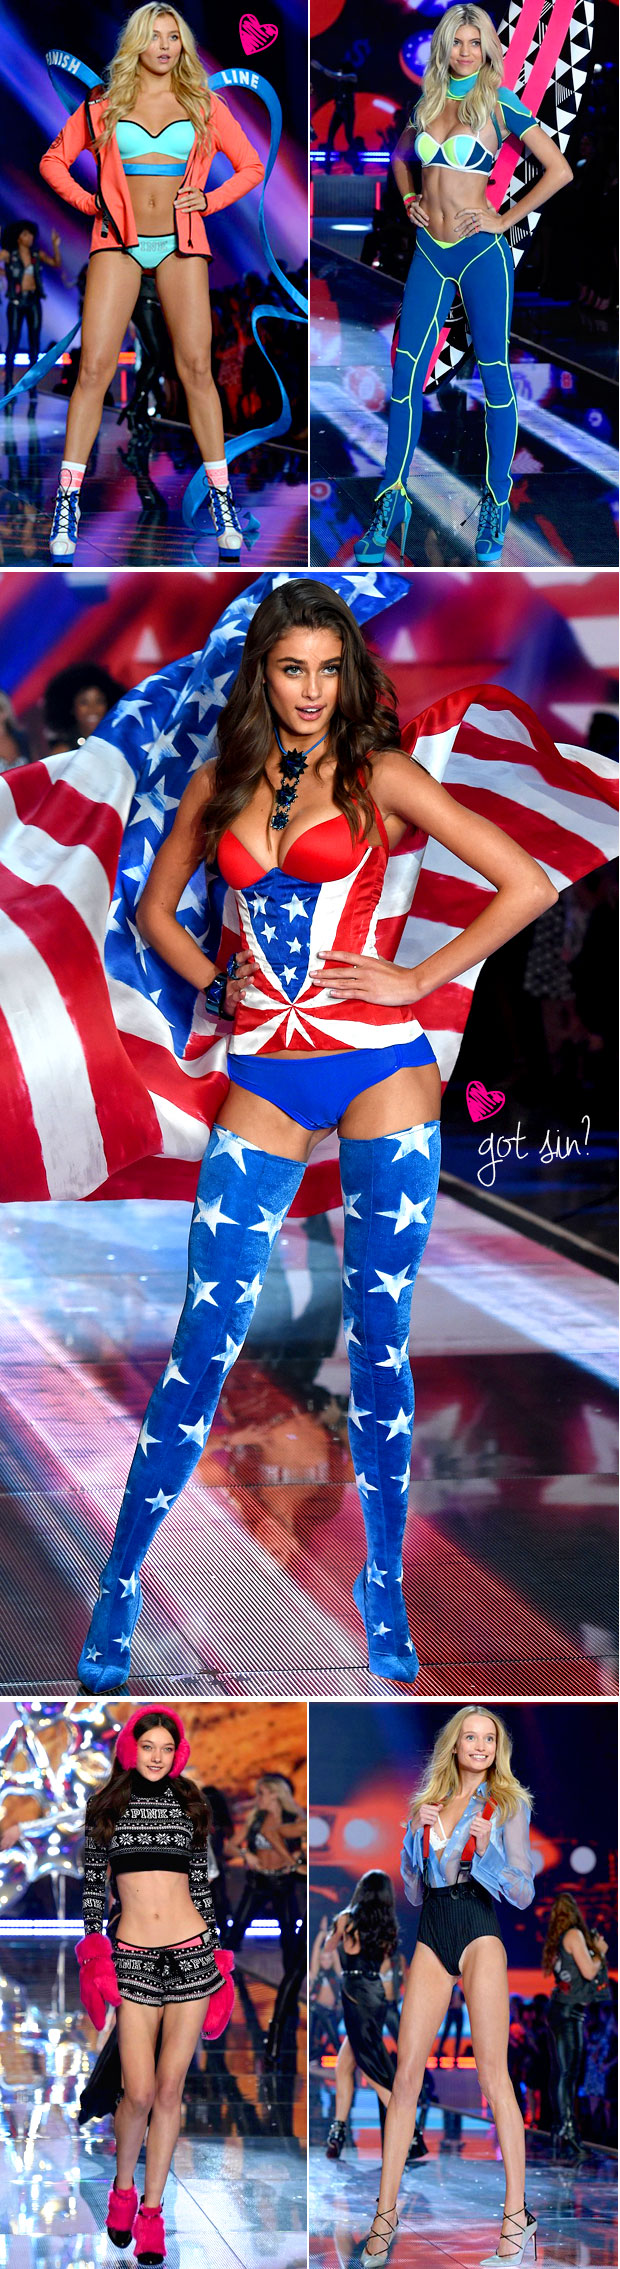 victorias-secret-fashion-show-todas-as-fotos-blog-got-sin-PINK-USA-taylor-hill